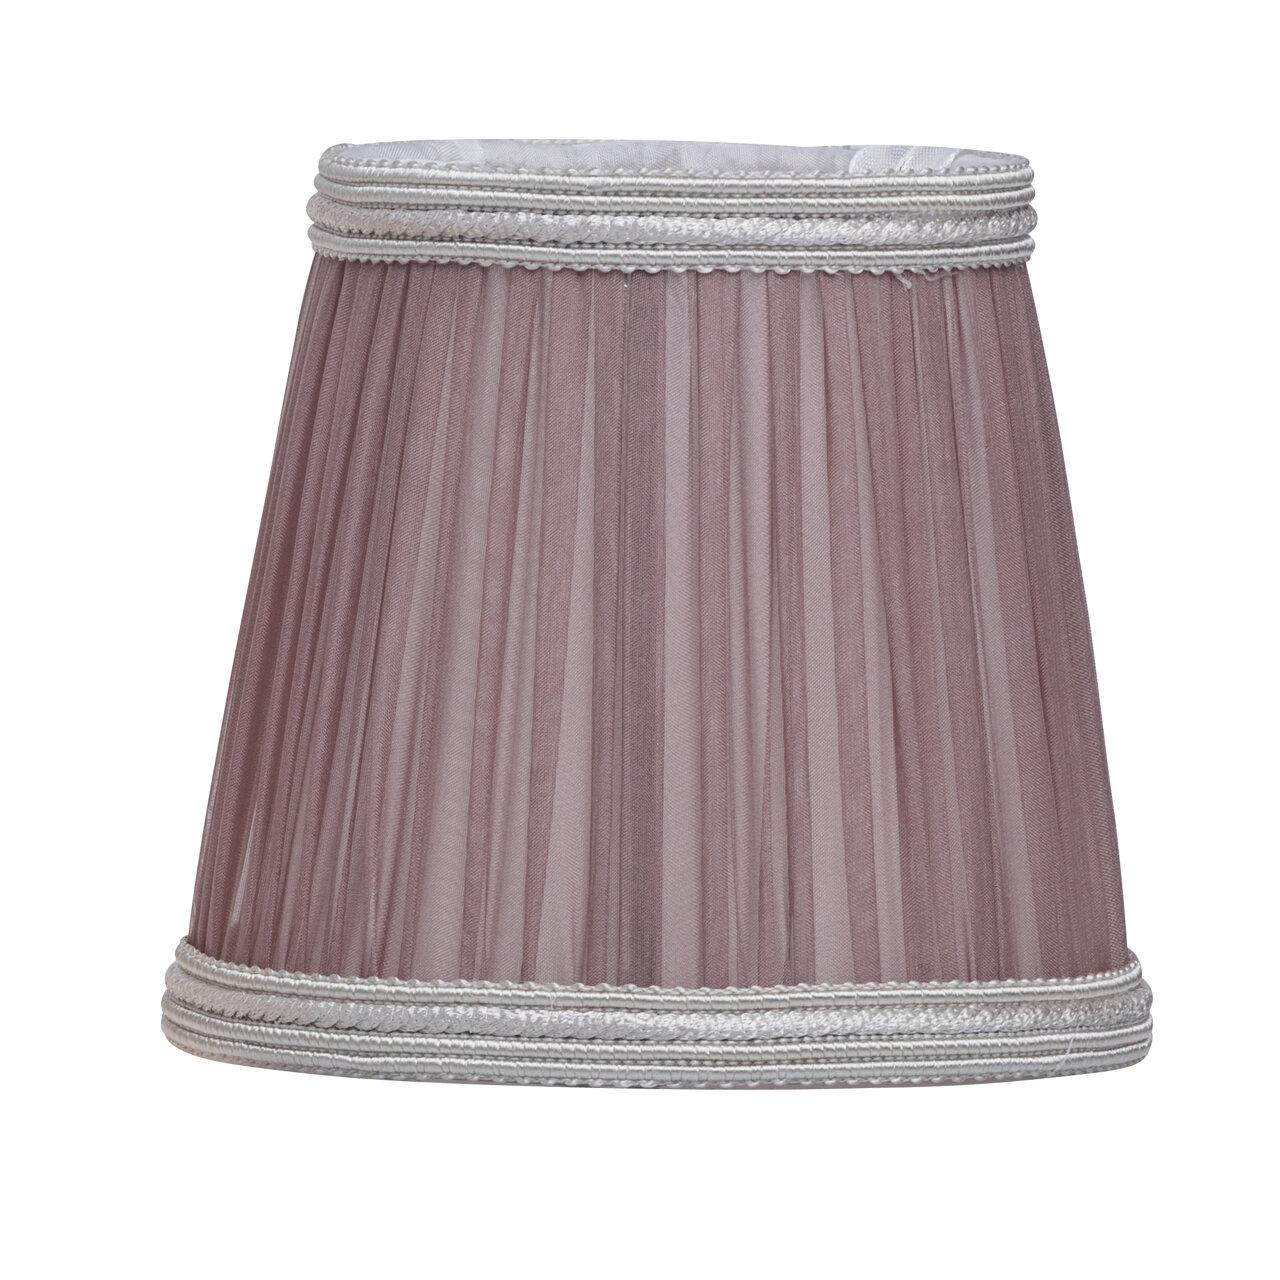 Lily Manor 12cm Fabric Bell Lamp Shade Wayfair Co Uk